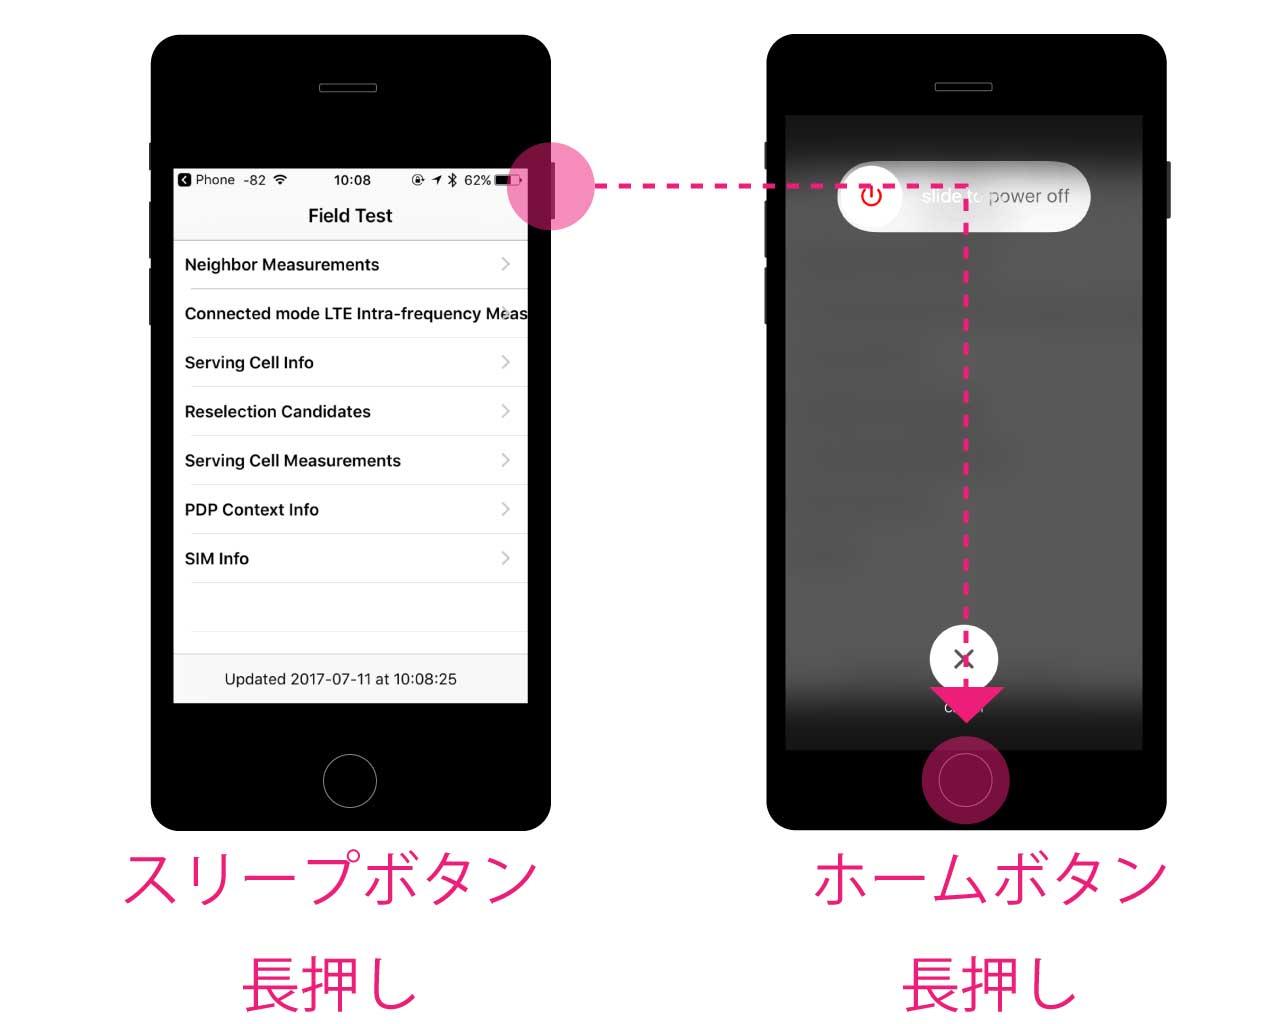 iphone-reception-setting-technic-fieldtest-3